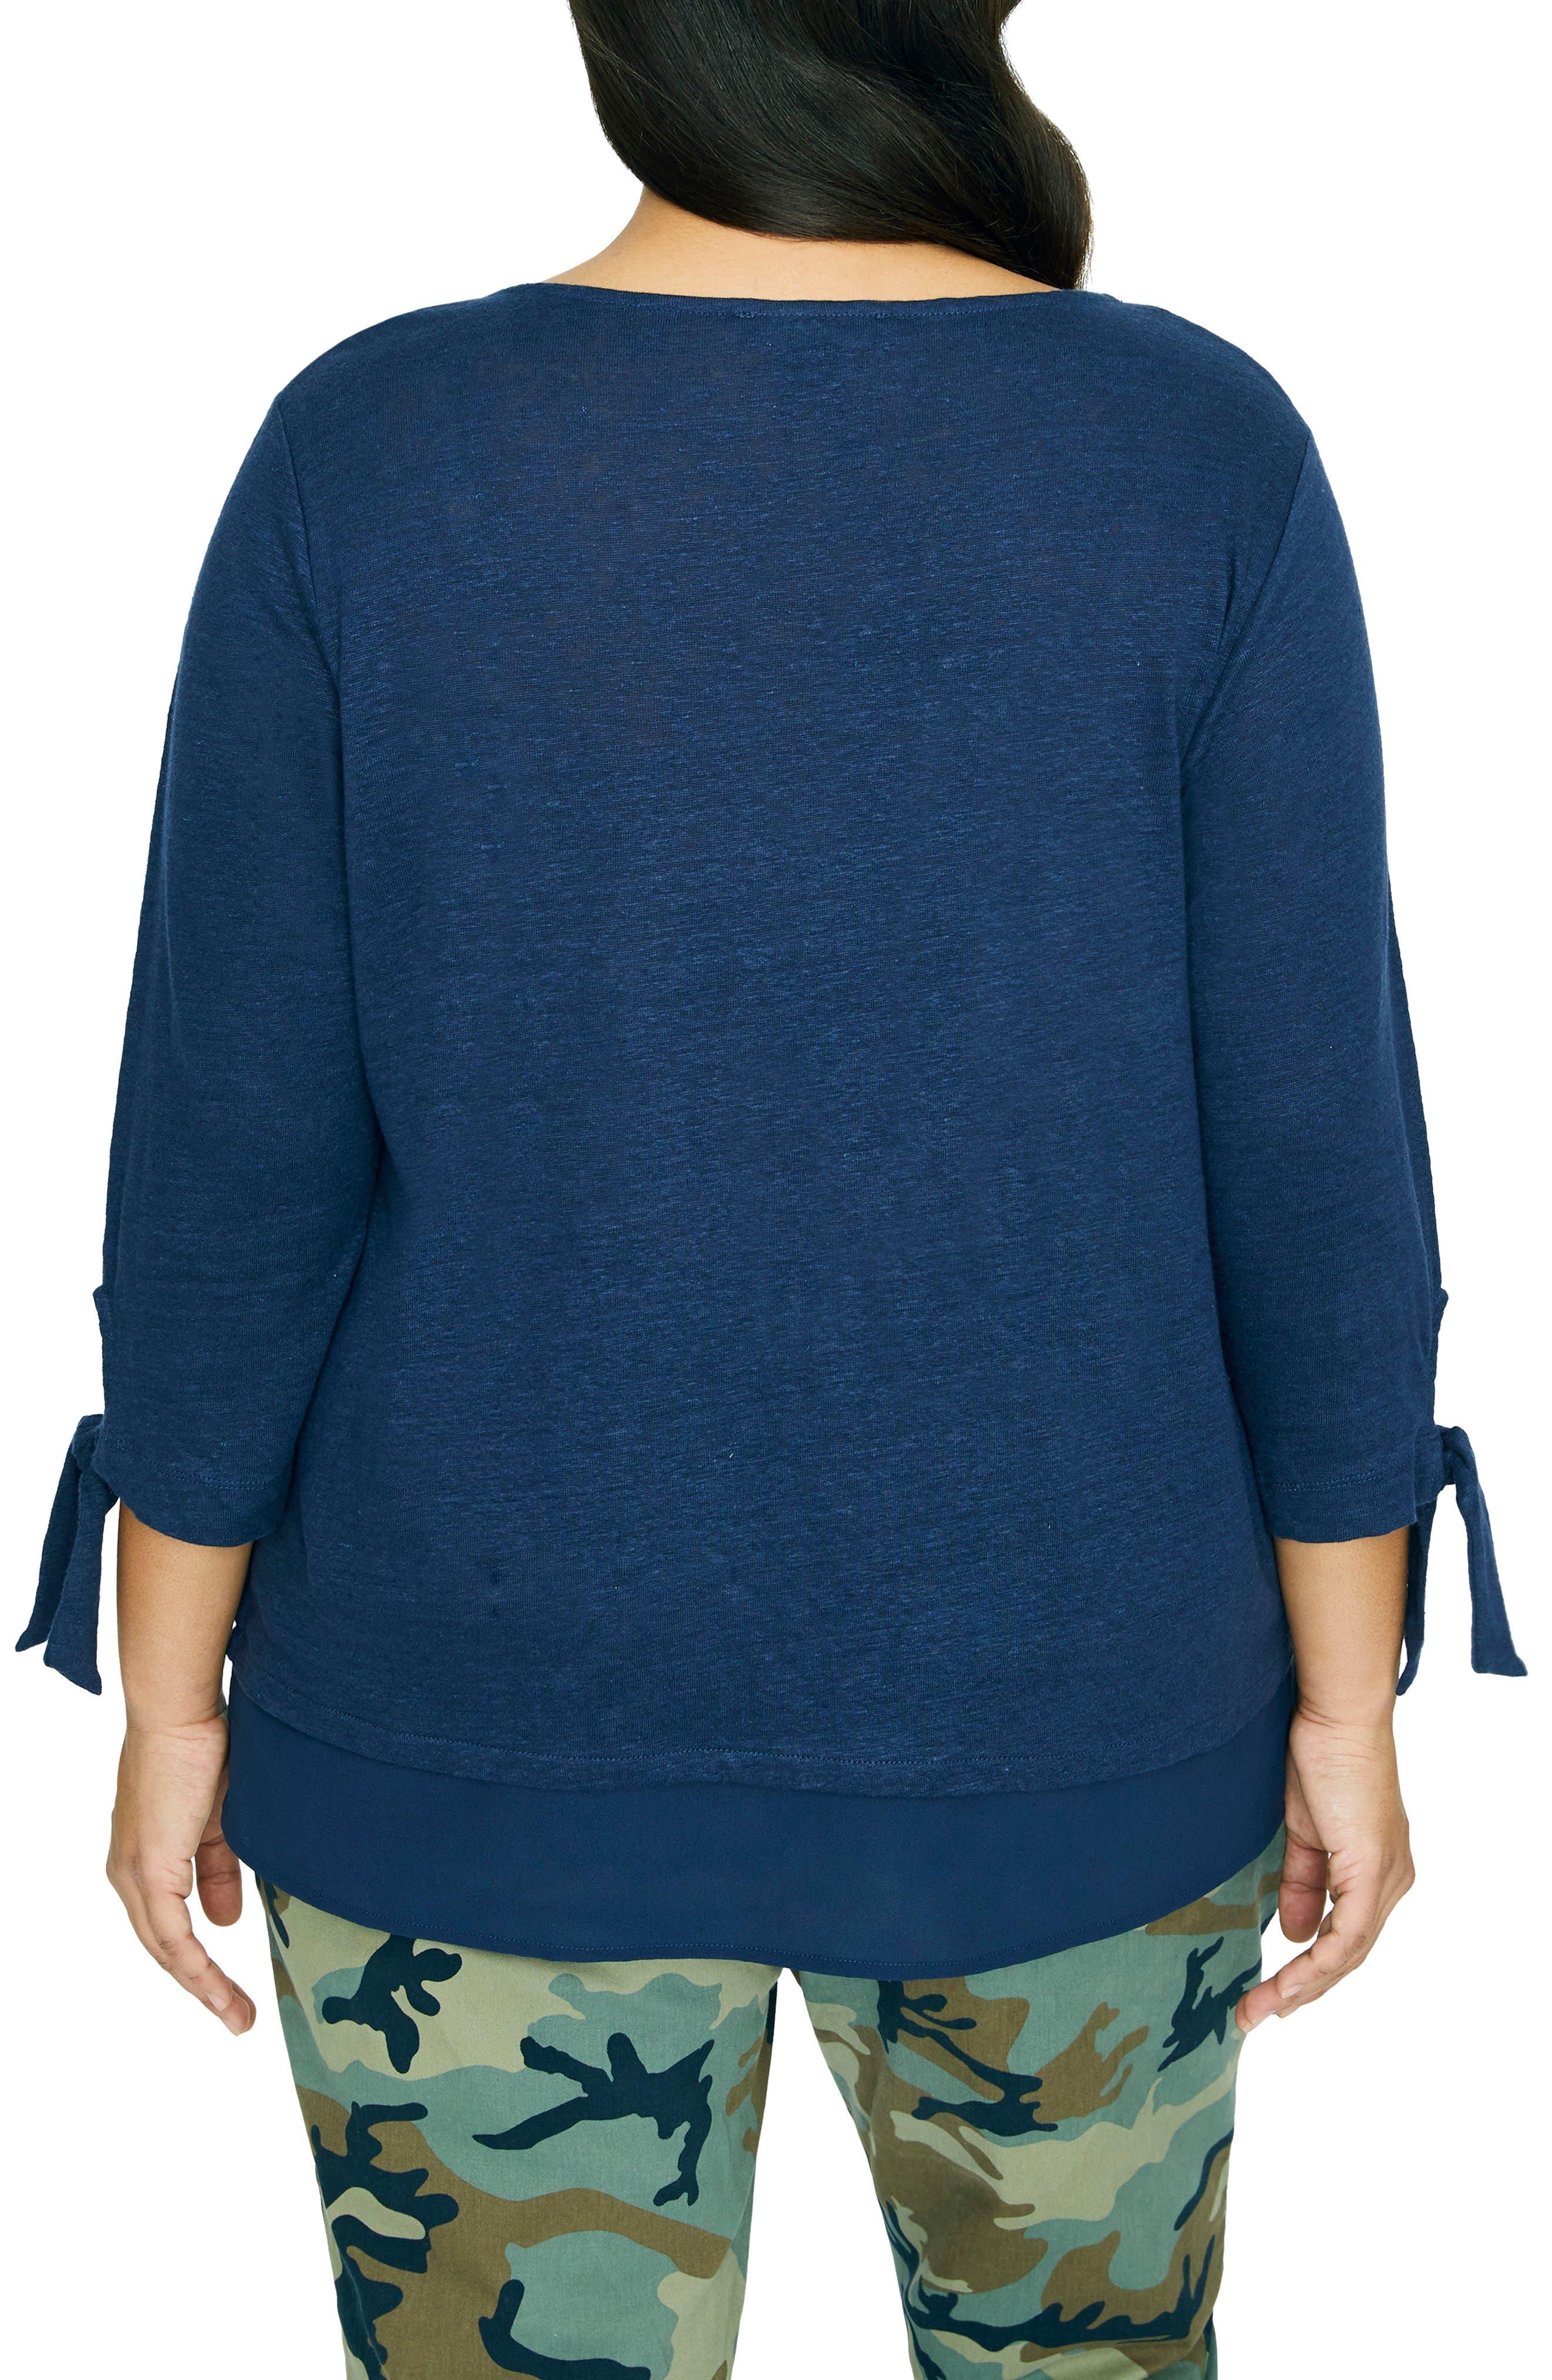 a1a997907393fc T-Shirts Sanctuary Clothing